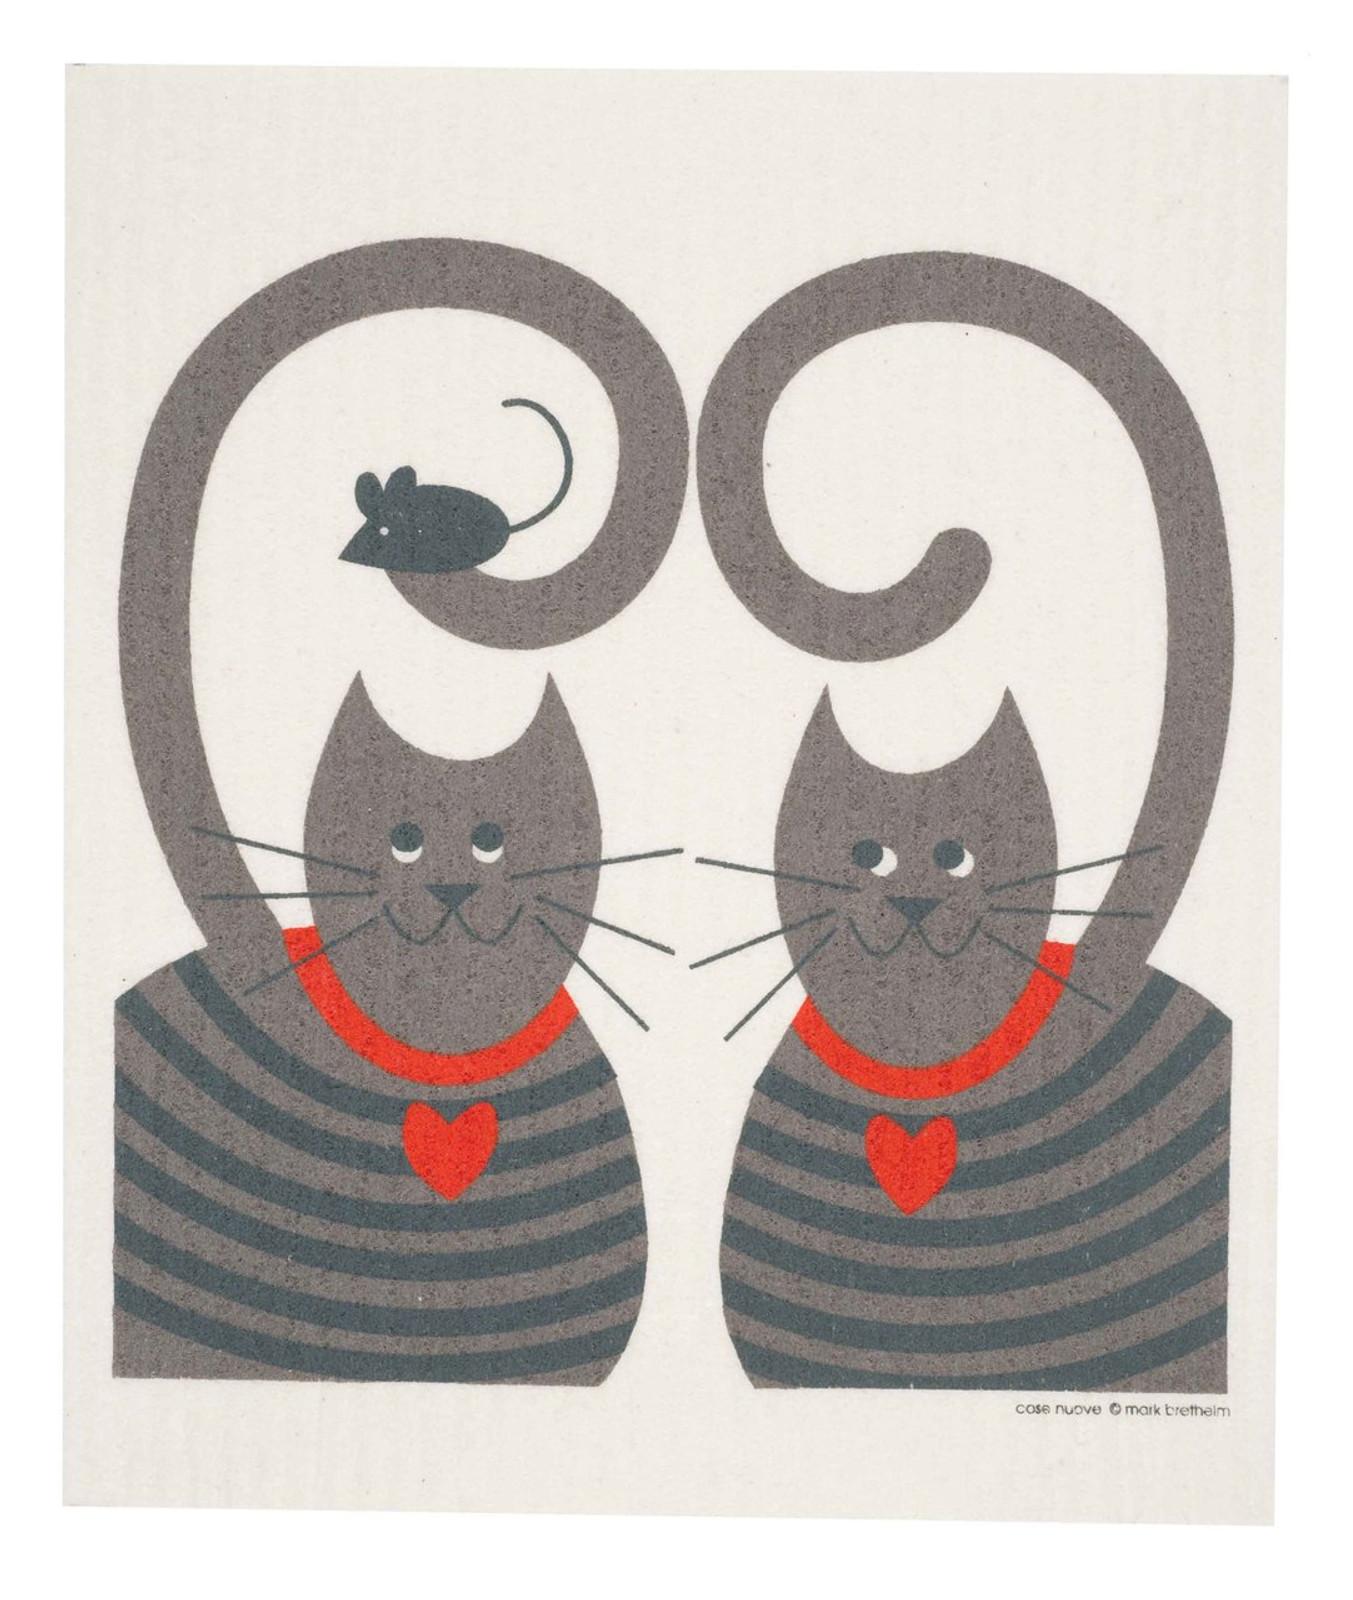 Swedish dish cloth, Cats design